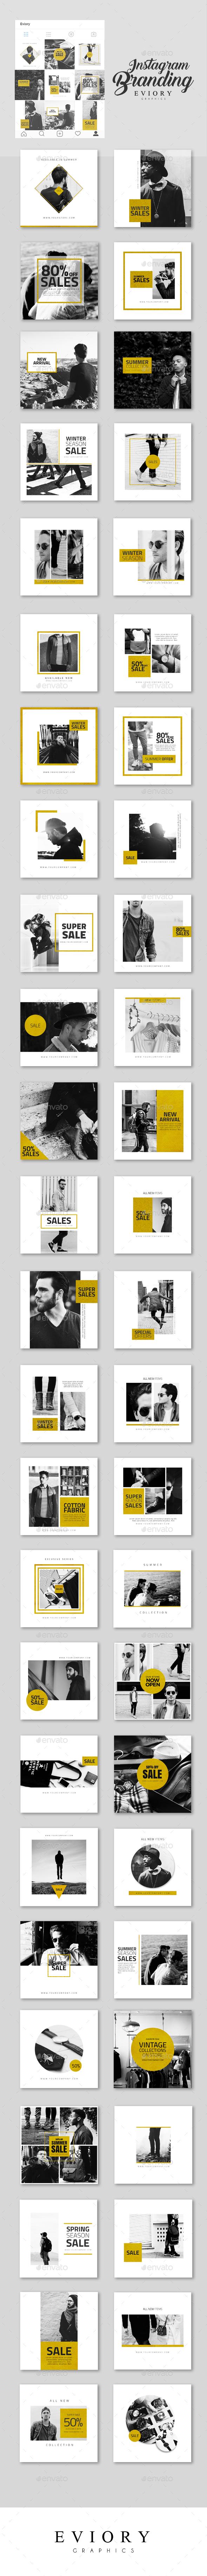 GraphicRiver Instagram Branding Gold Edition 20466083